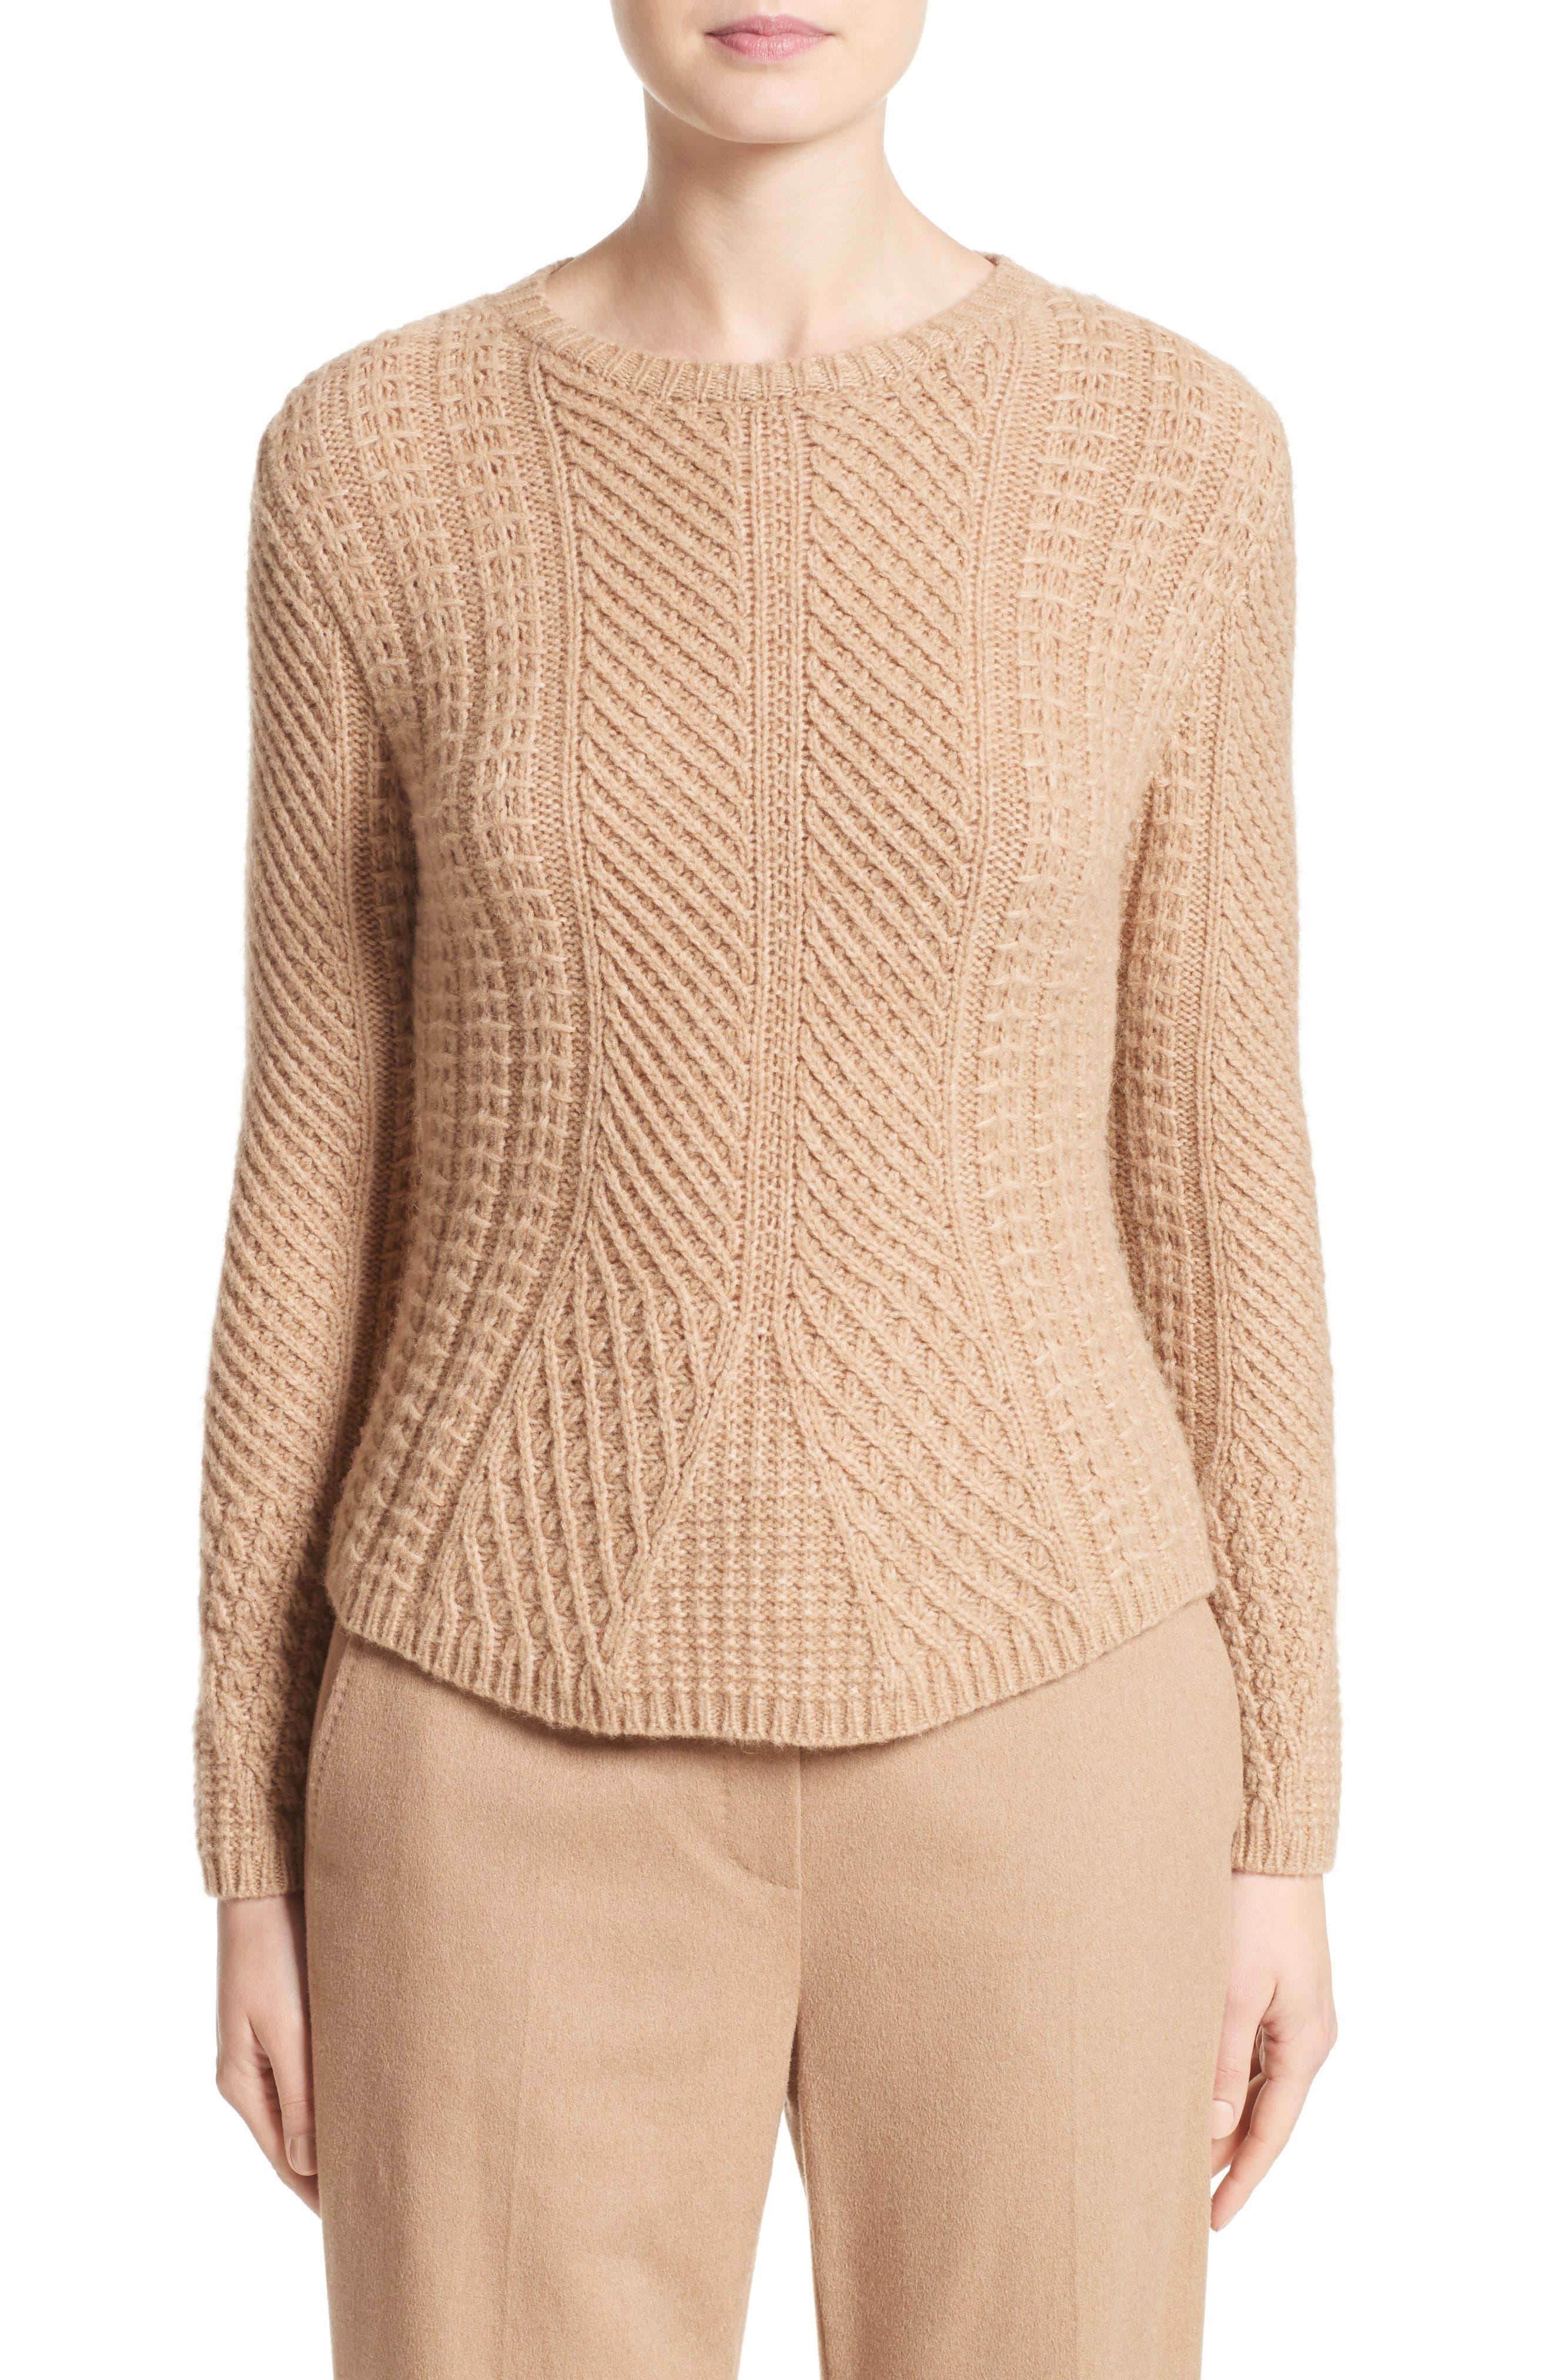 Alternate Image 1 Selected - Max Mara Ronco Sweater